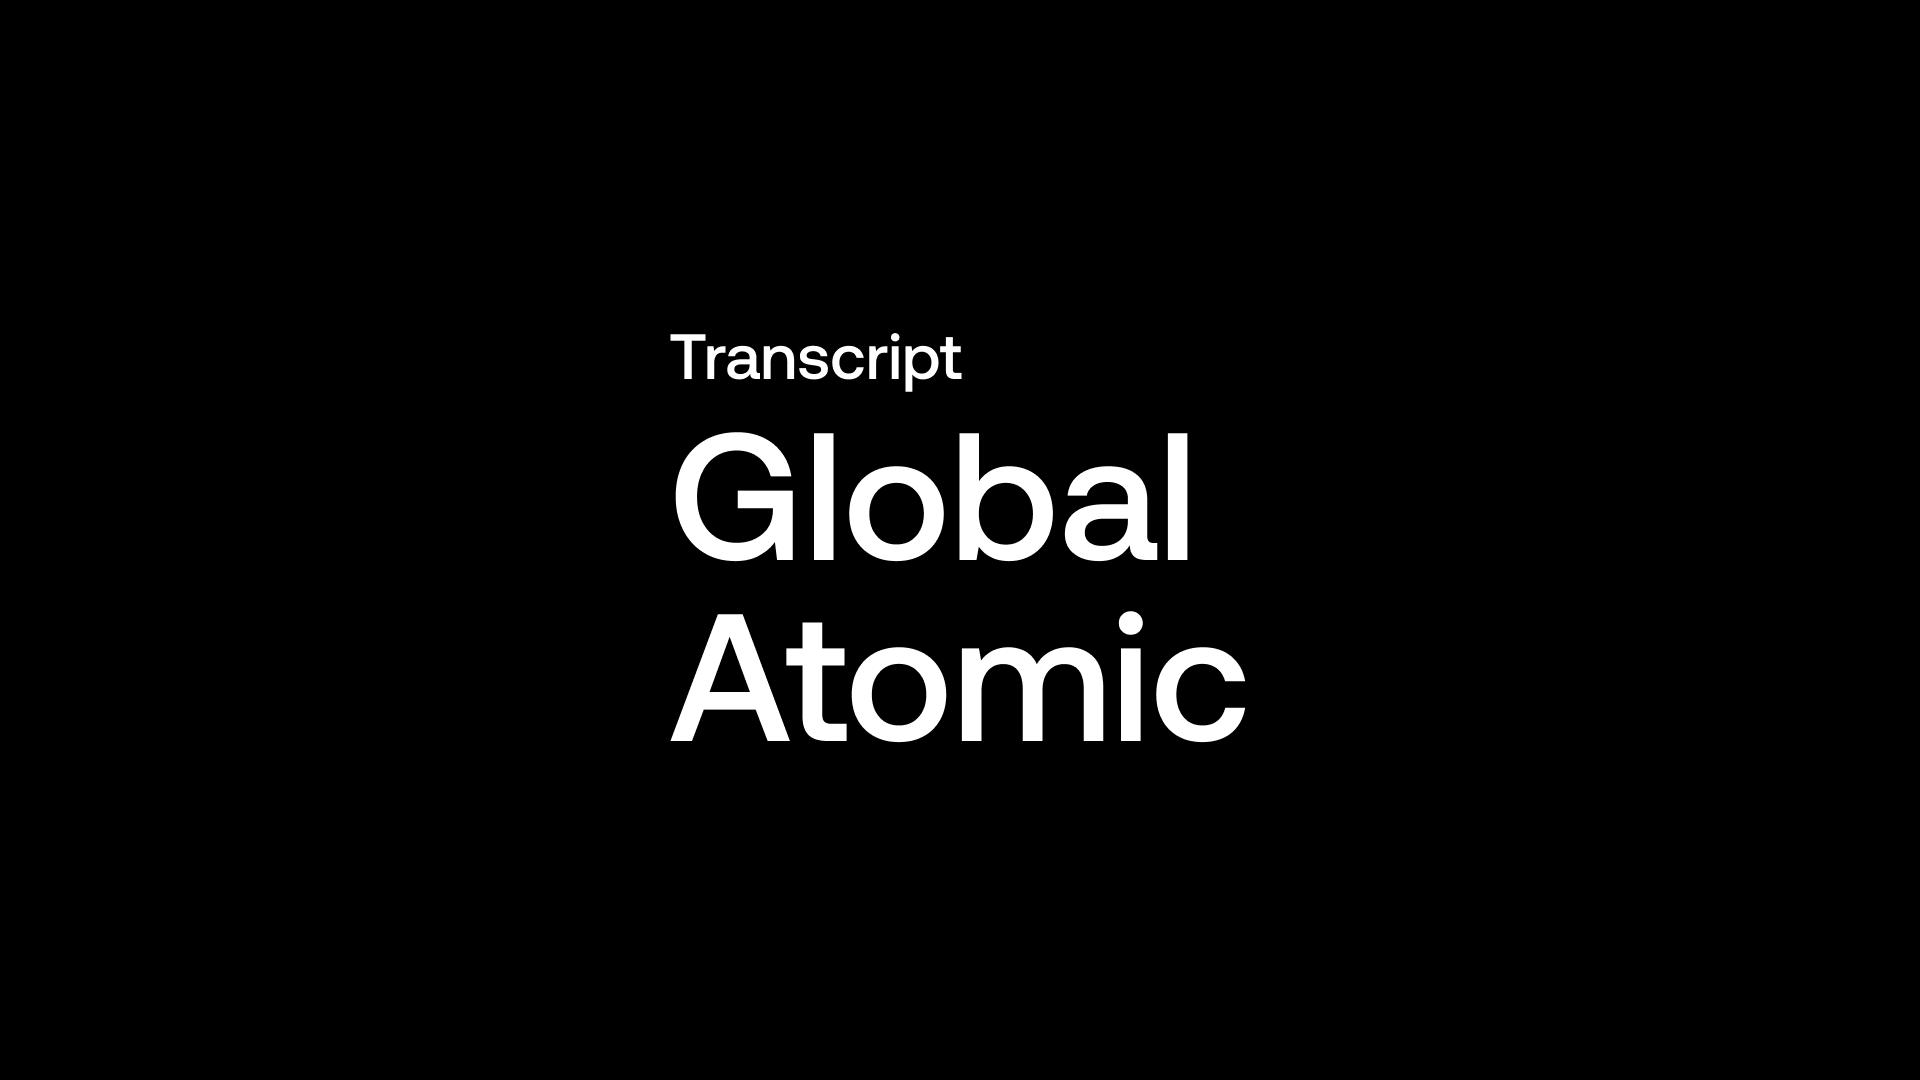 Transcript: Global Atomic (GLO) - 12x Bagger Uranium Junior Closest to Production